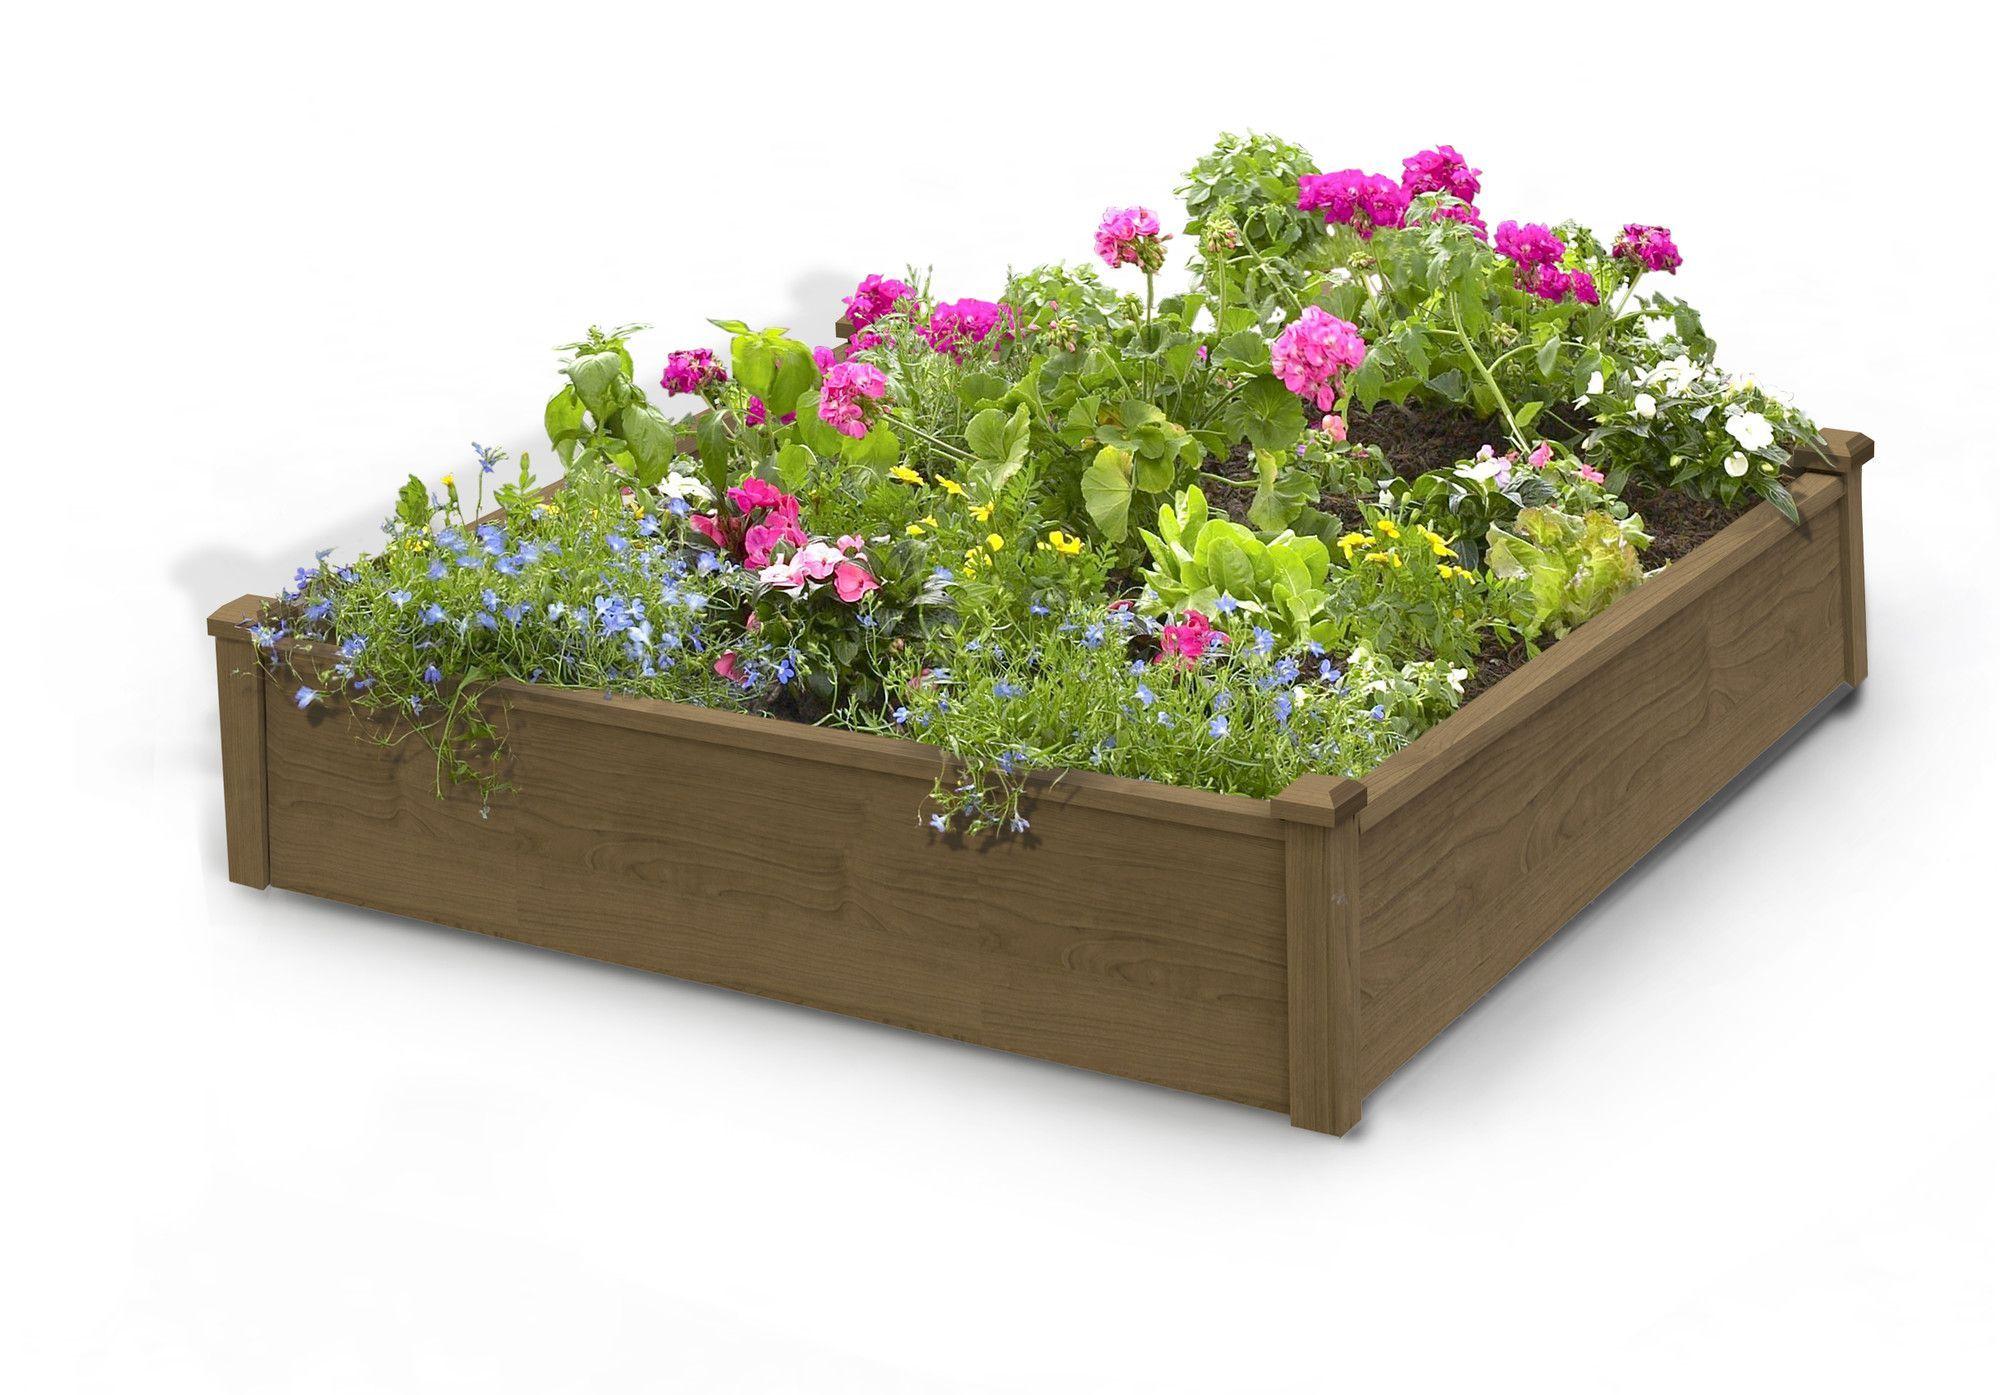 Fir Wood Raised Garden Raised garden bed kits, Building